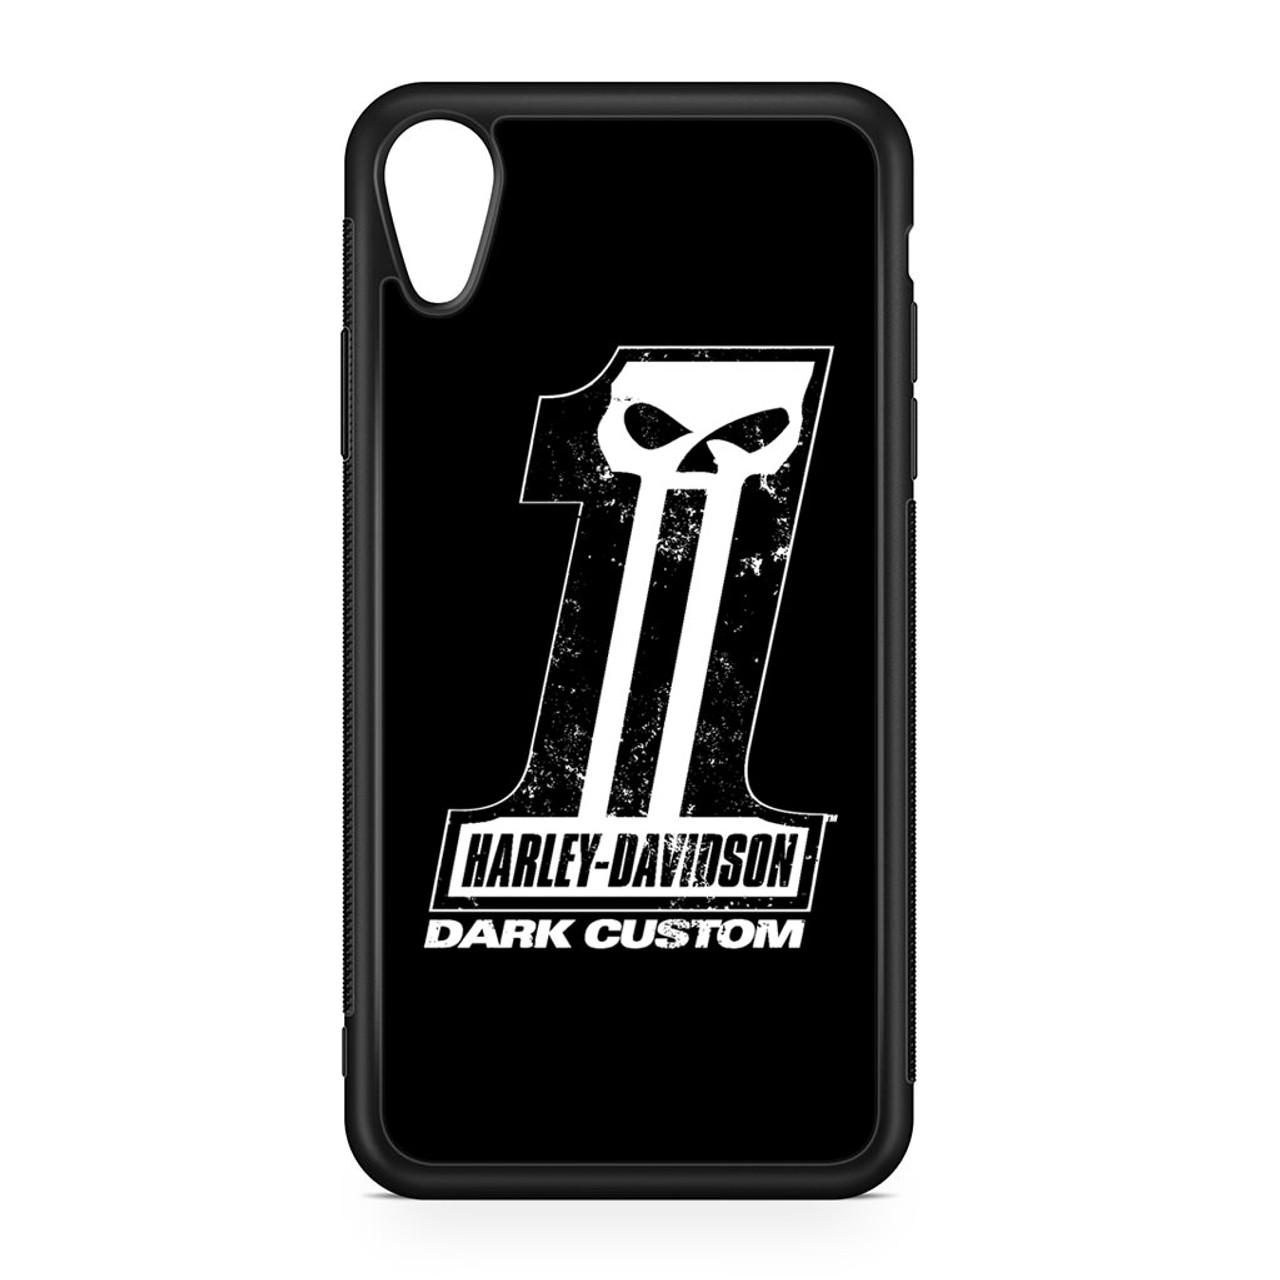 Harley Davidson Dark Custom Iphone Xr Case